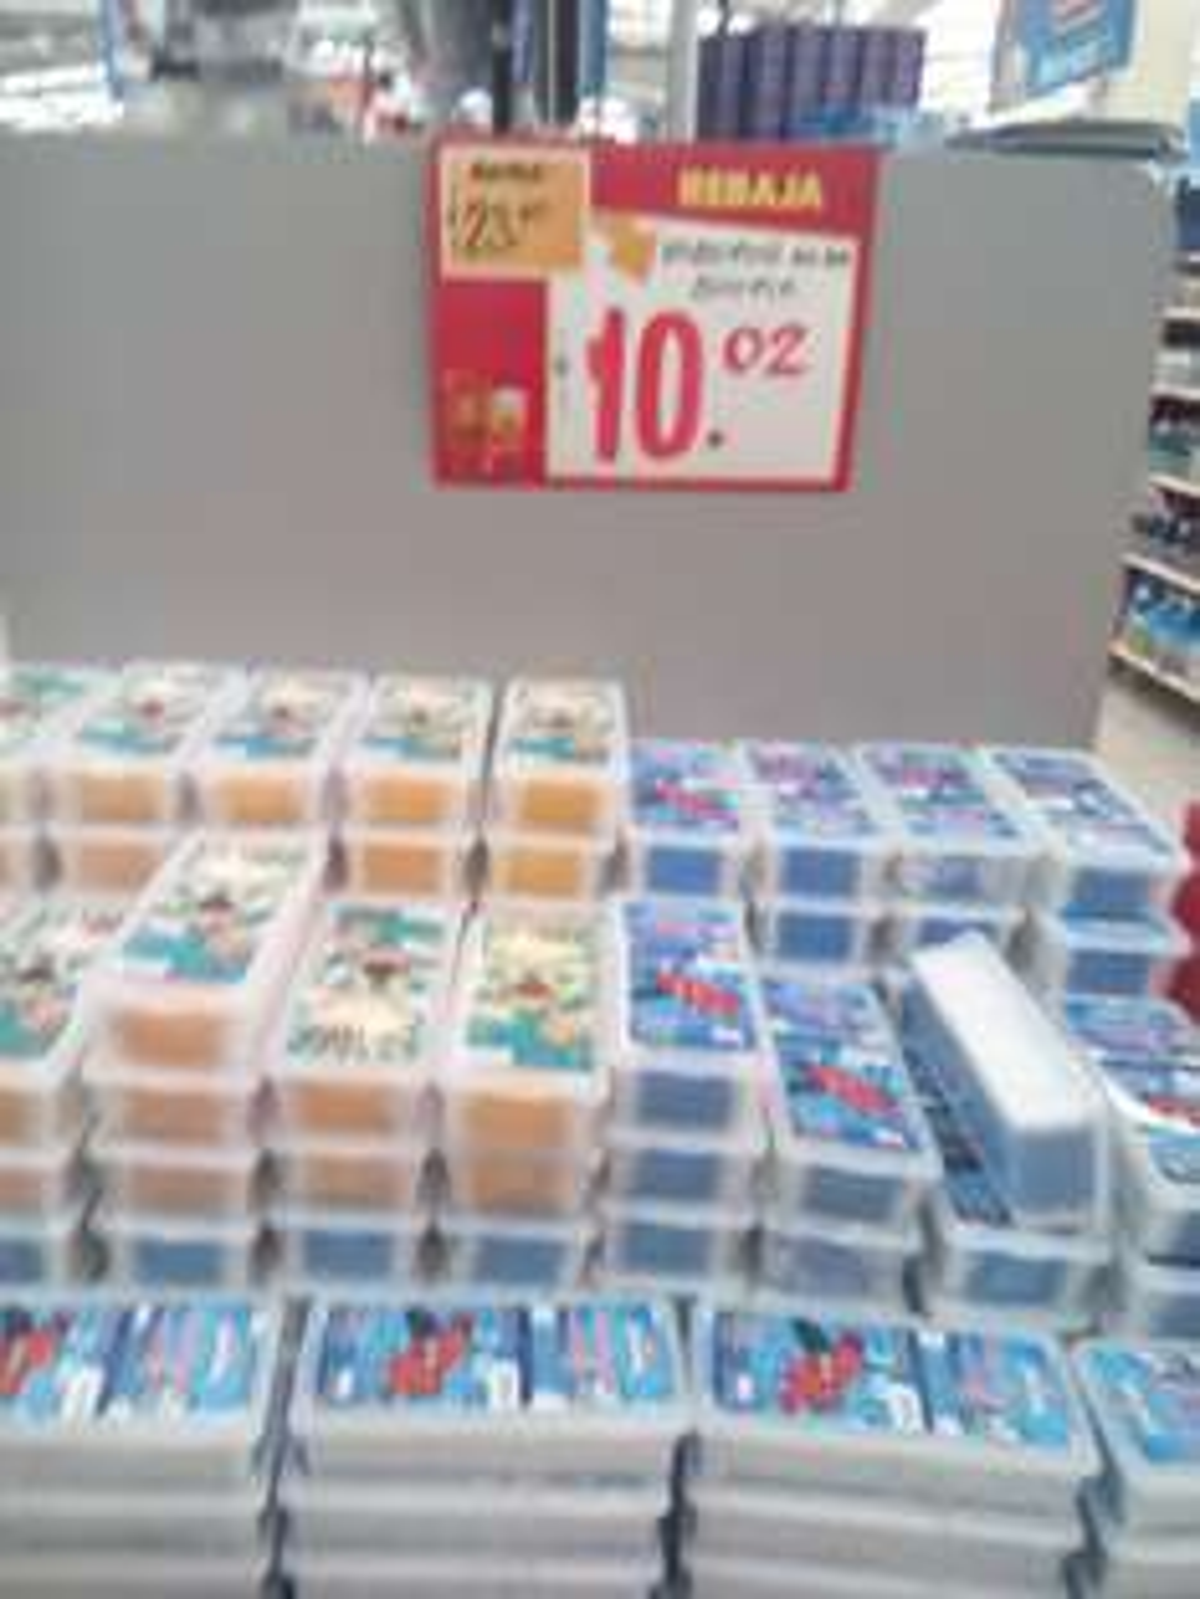 Walmart: 500 hisopos para niño a solo $10.02